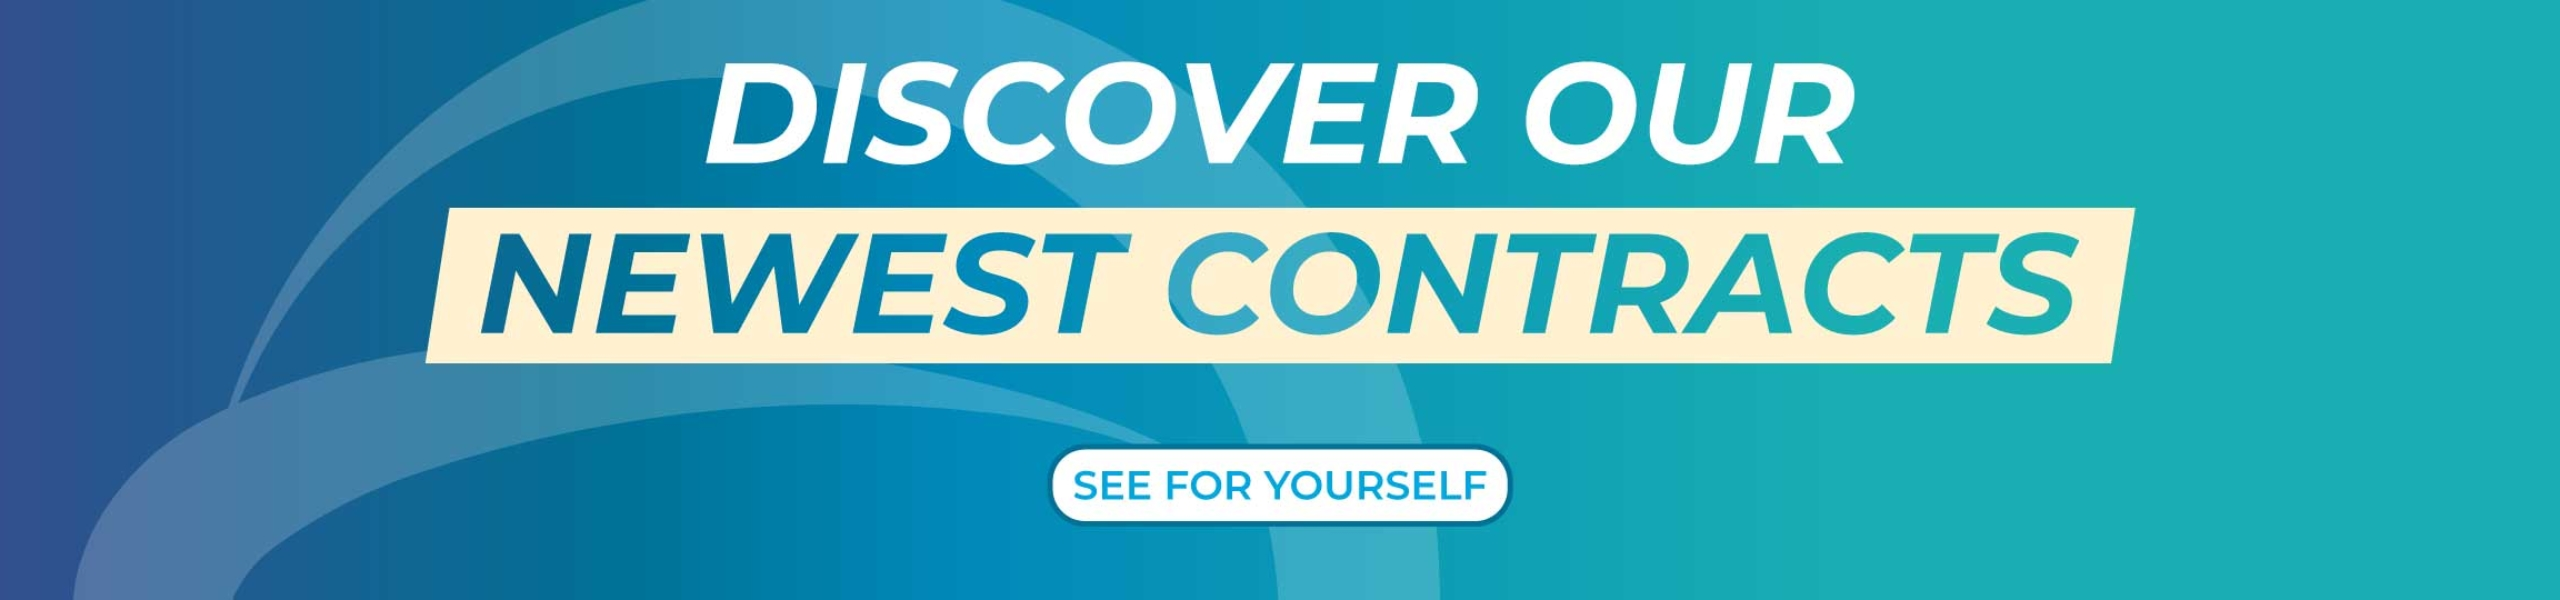 Explore New Contracts